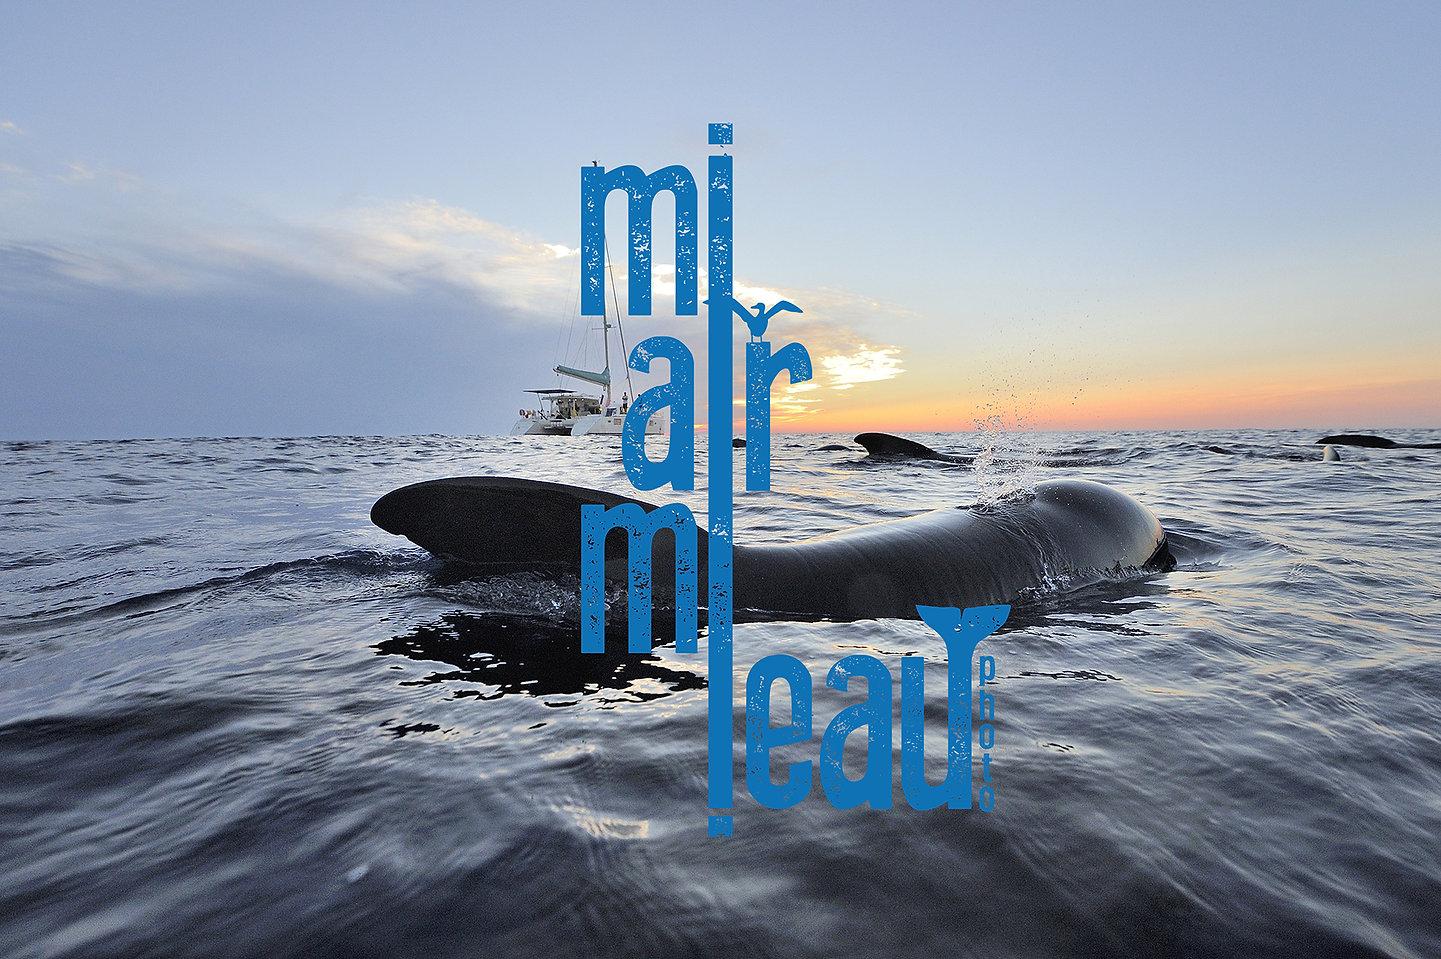 Frederic Bassemayousse - Photographe - Mi Air Mi Eau Photo, Pilot whale, globicéphale, Méditerranée, Mediterranean sea, sun set, sailing boat, Lagoon 440